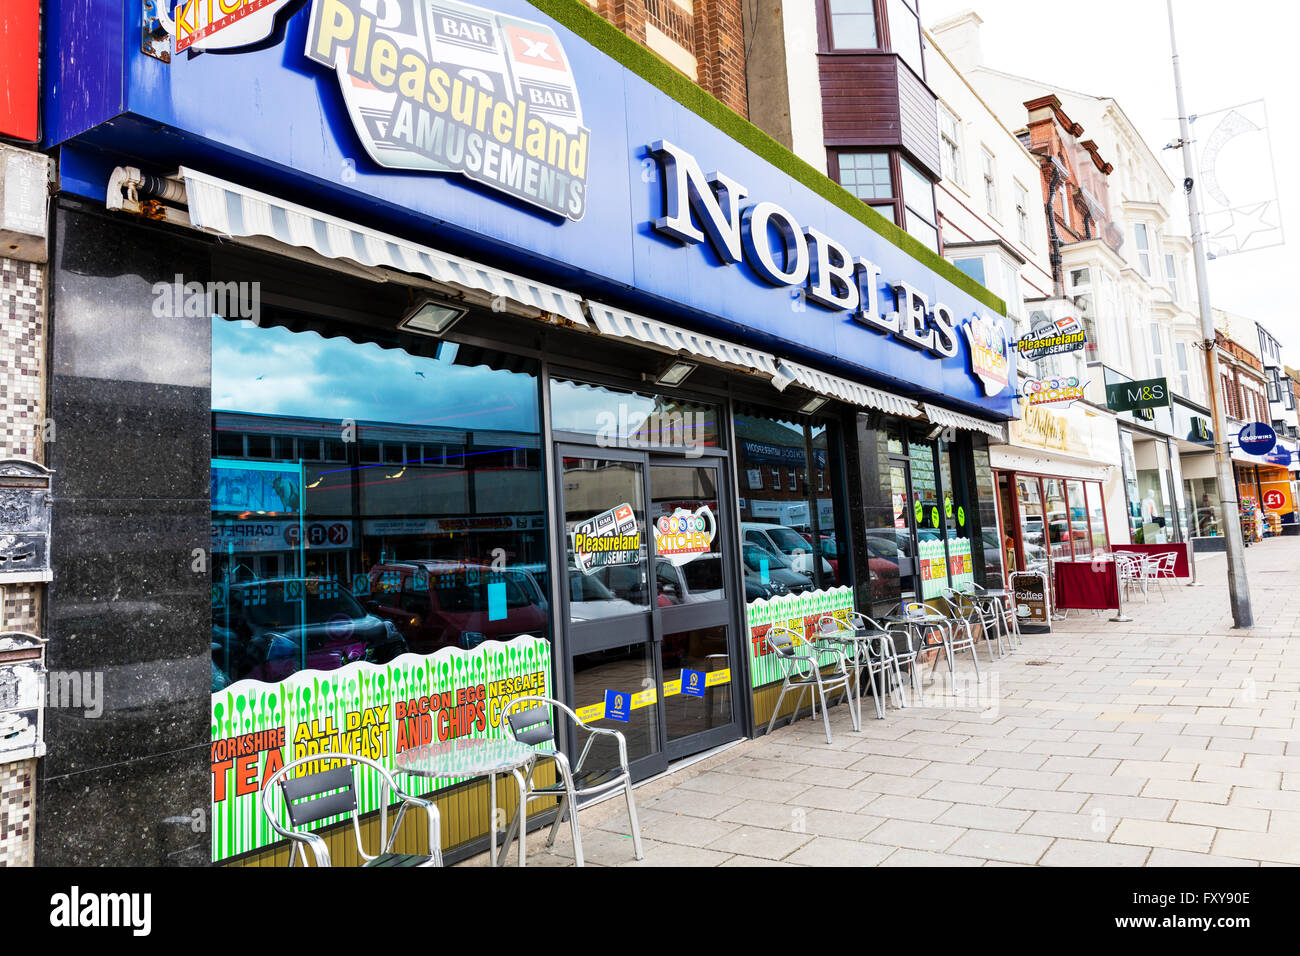 Nobles Amusement arcade Bridlington shop front sign exterior Yorkshire UK England coastal town towns - Stock Image